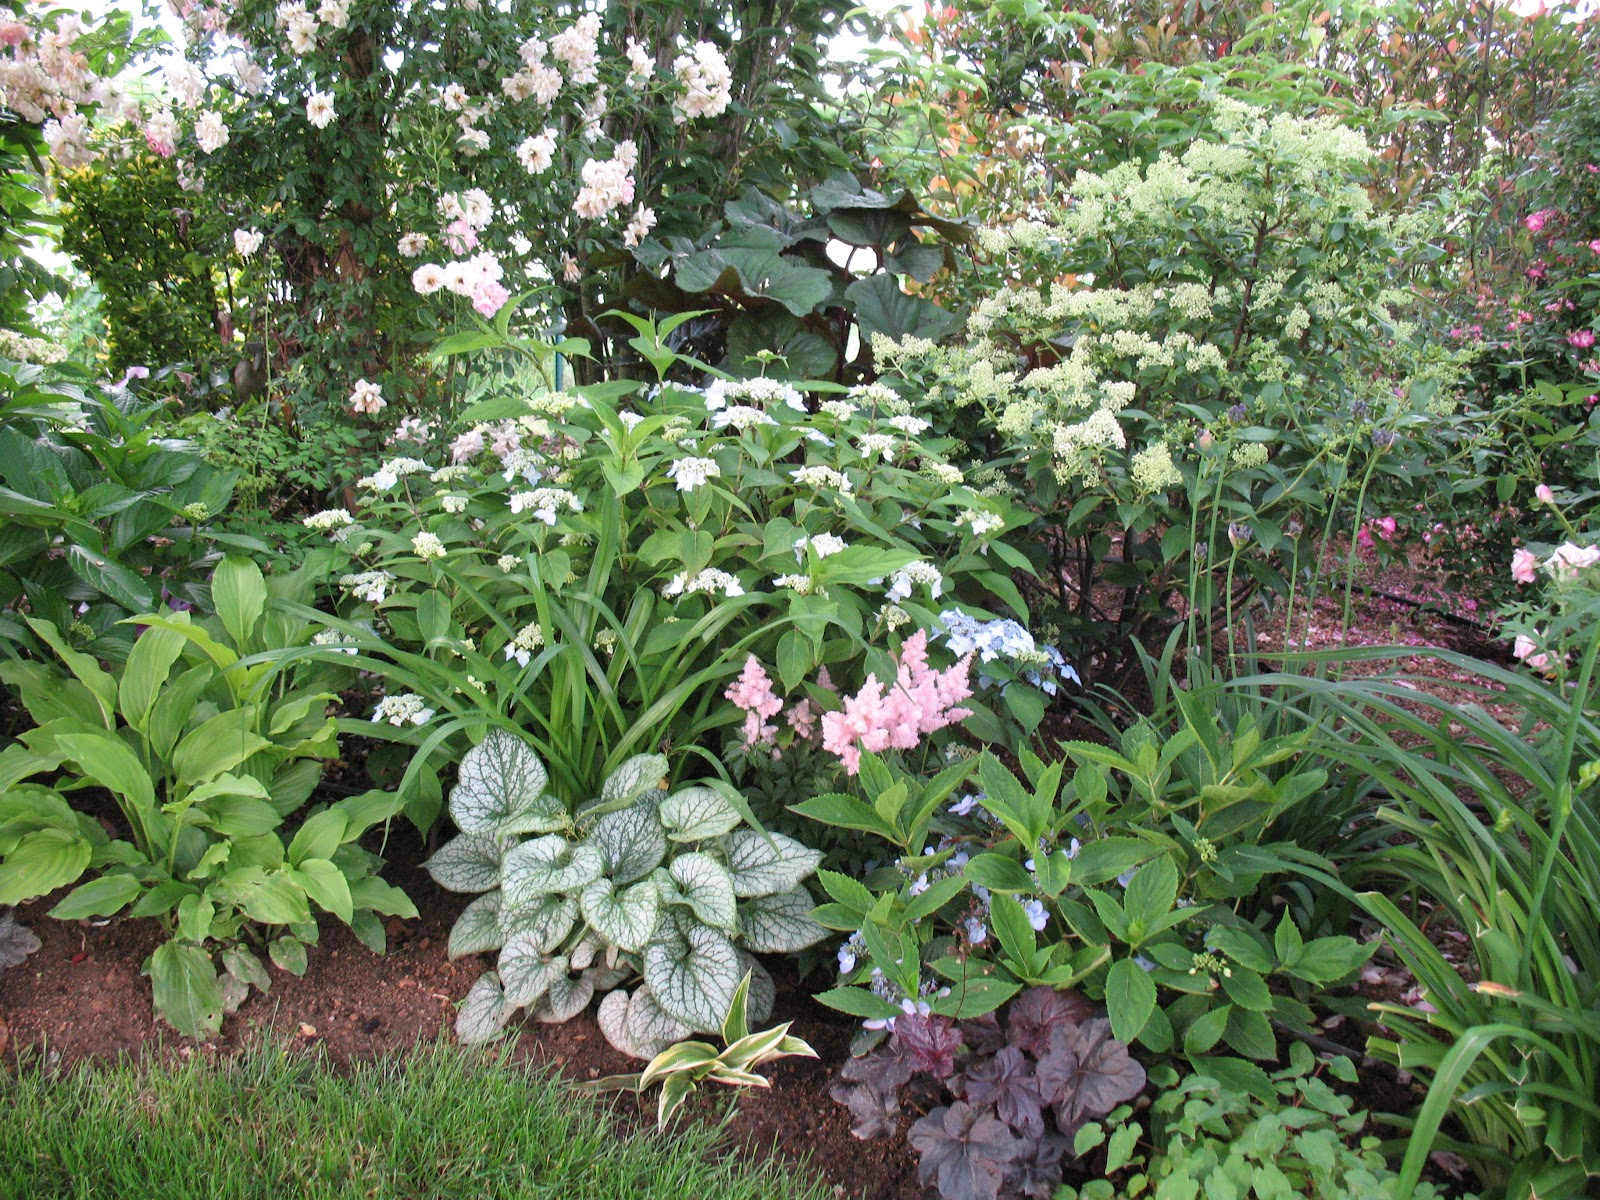 Roses du jardin ch neland hydrang a paniculata kyushu - Comment faire des boutures d hortensia ...